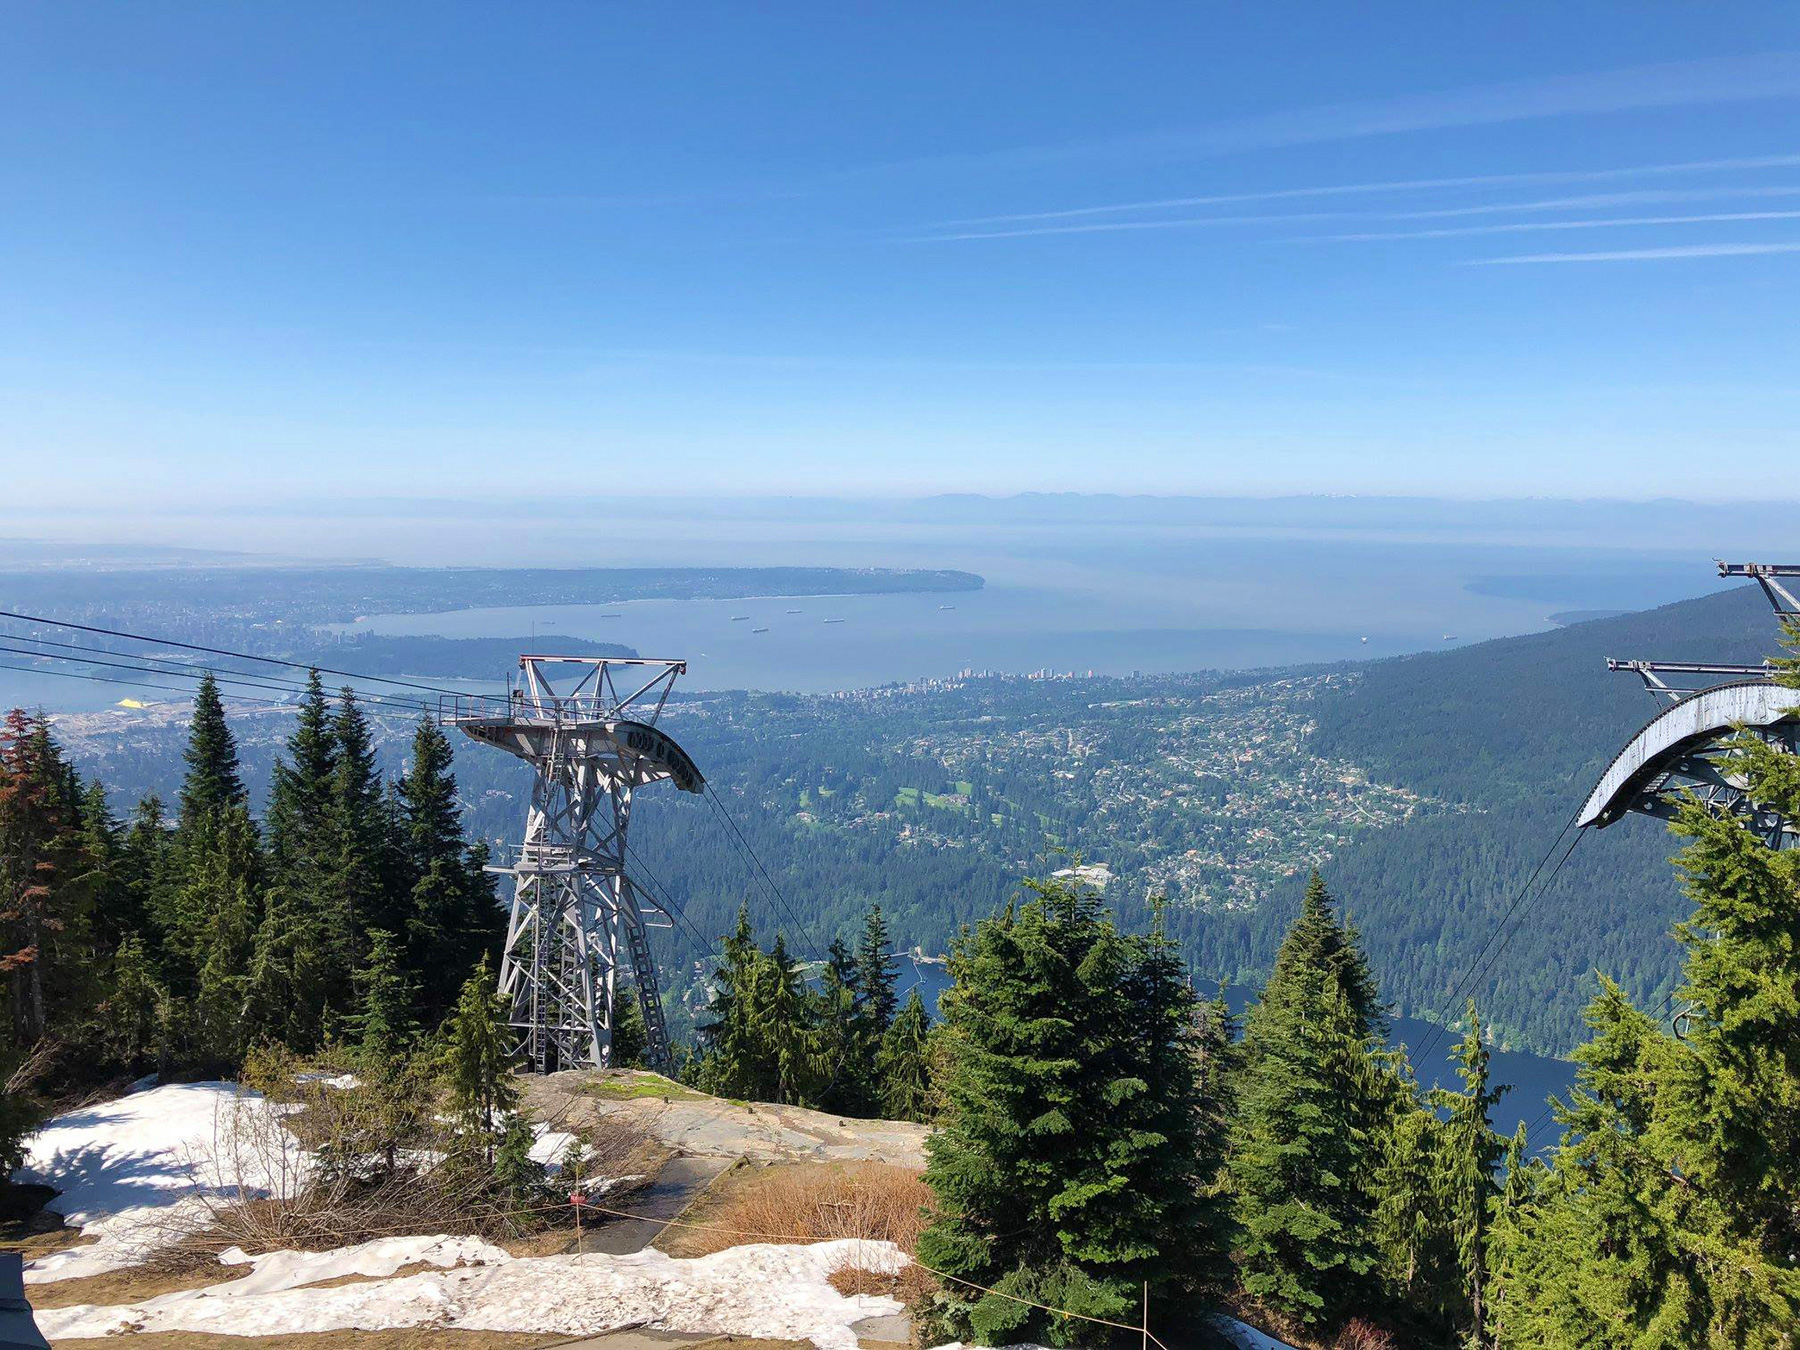 Aussicht von Vancouvers Grouse Mountain